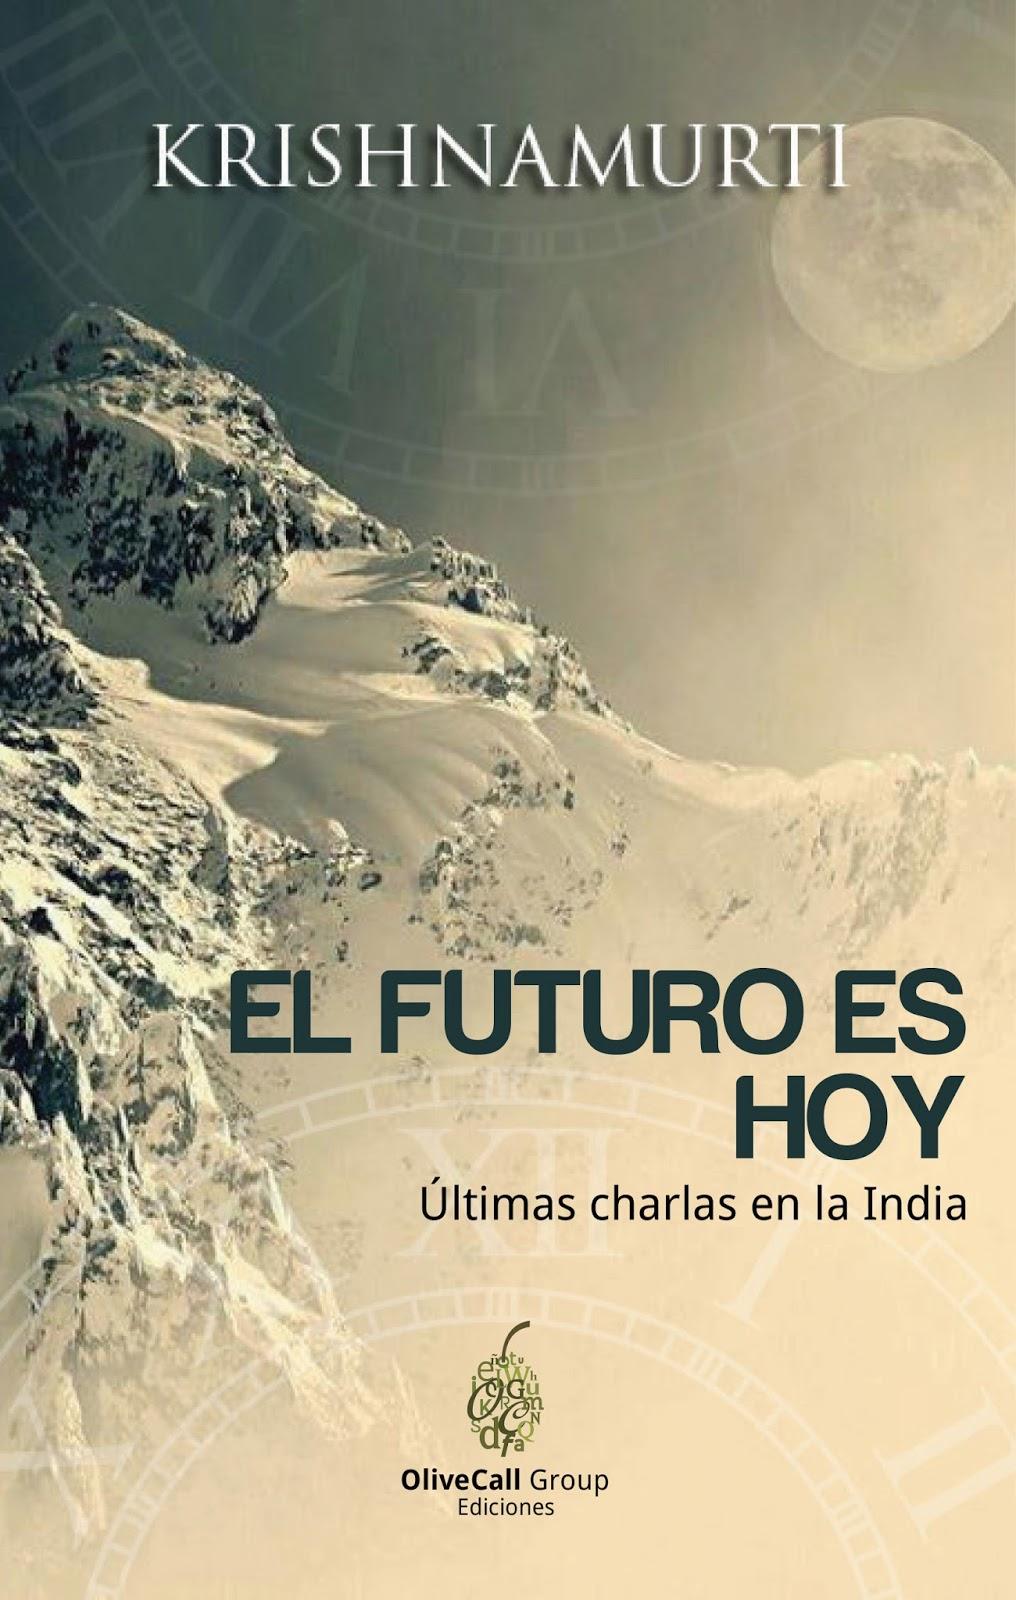 El Futuro es Hoy - Krishnamurti - OliveCall Group - Eduardo Callaey - Eduardo Kesting